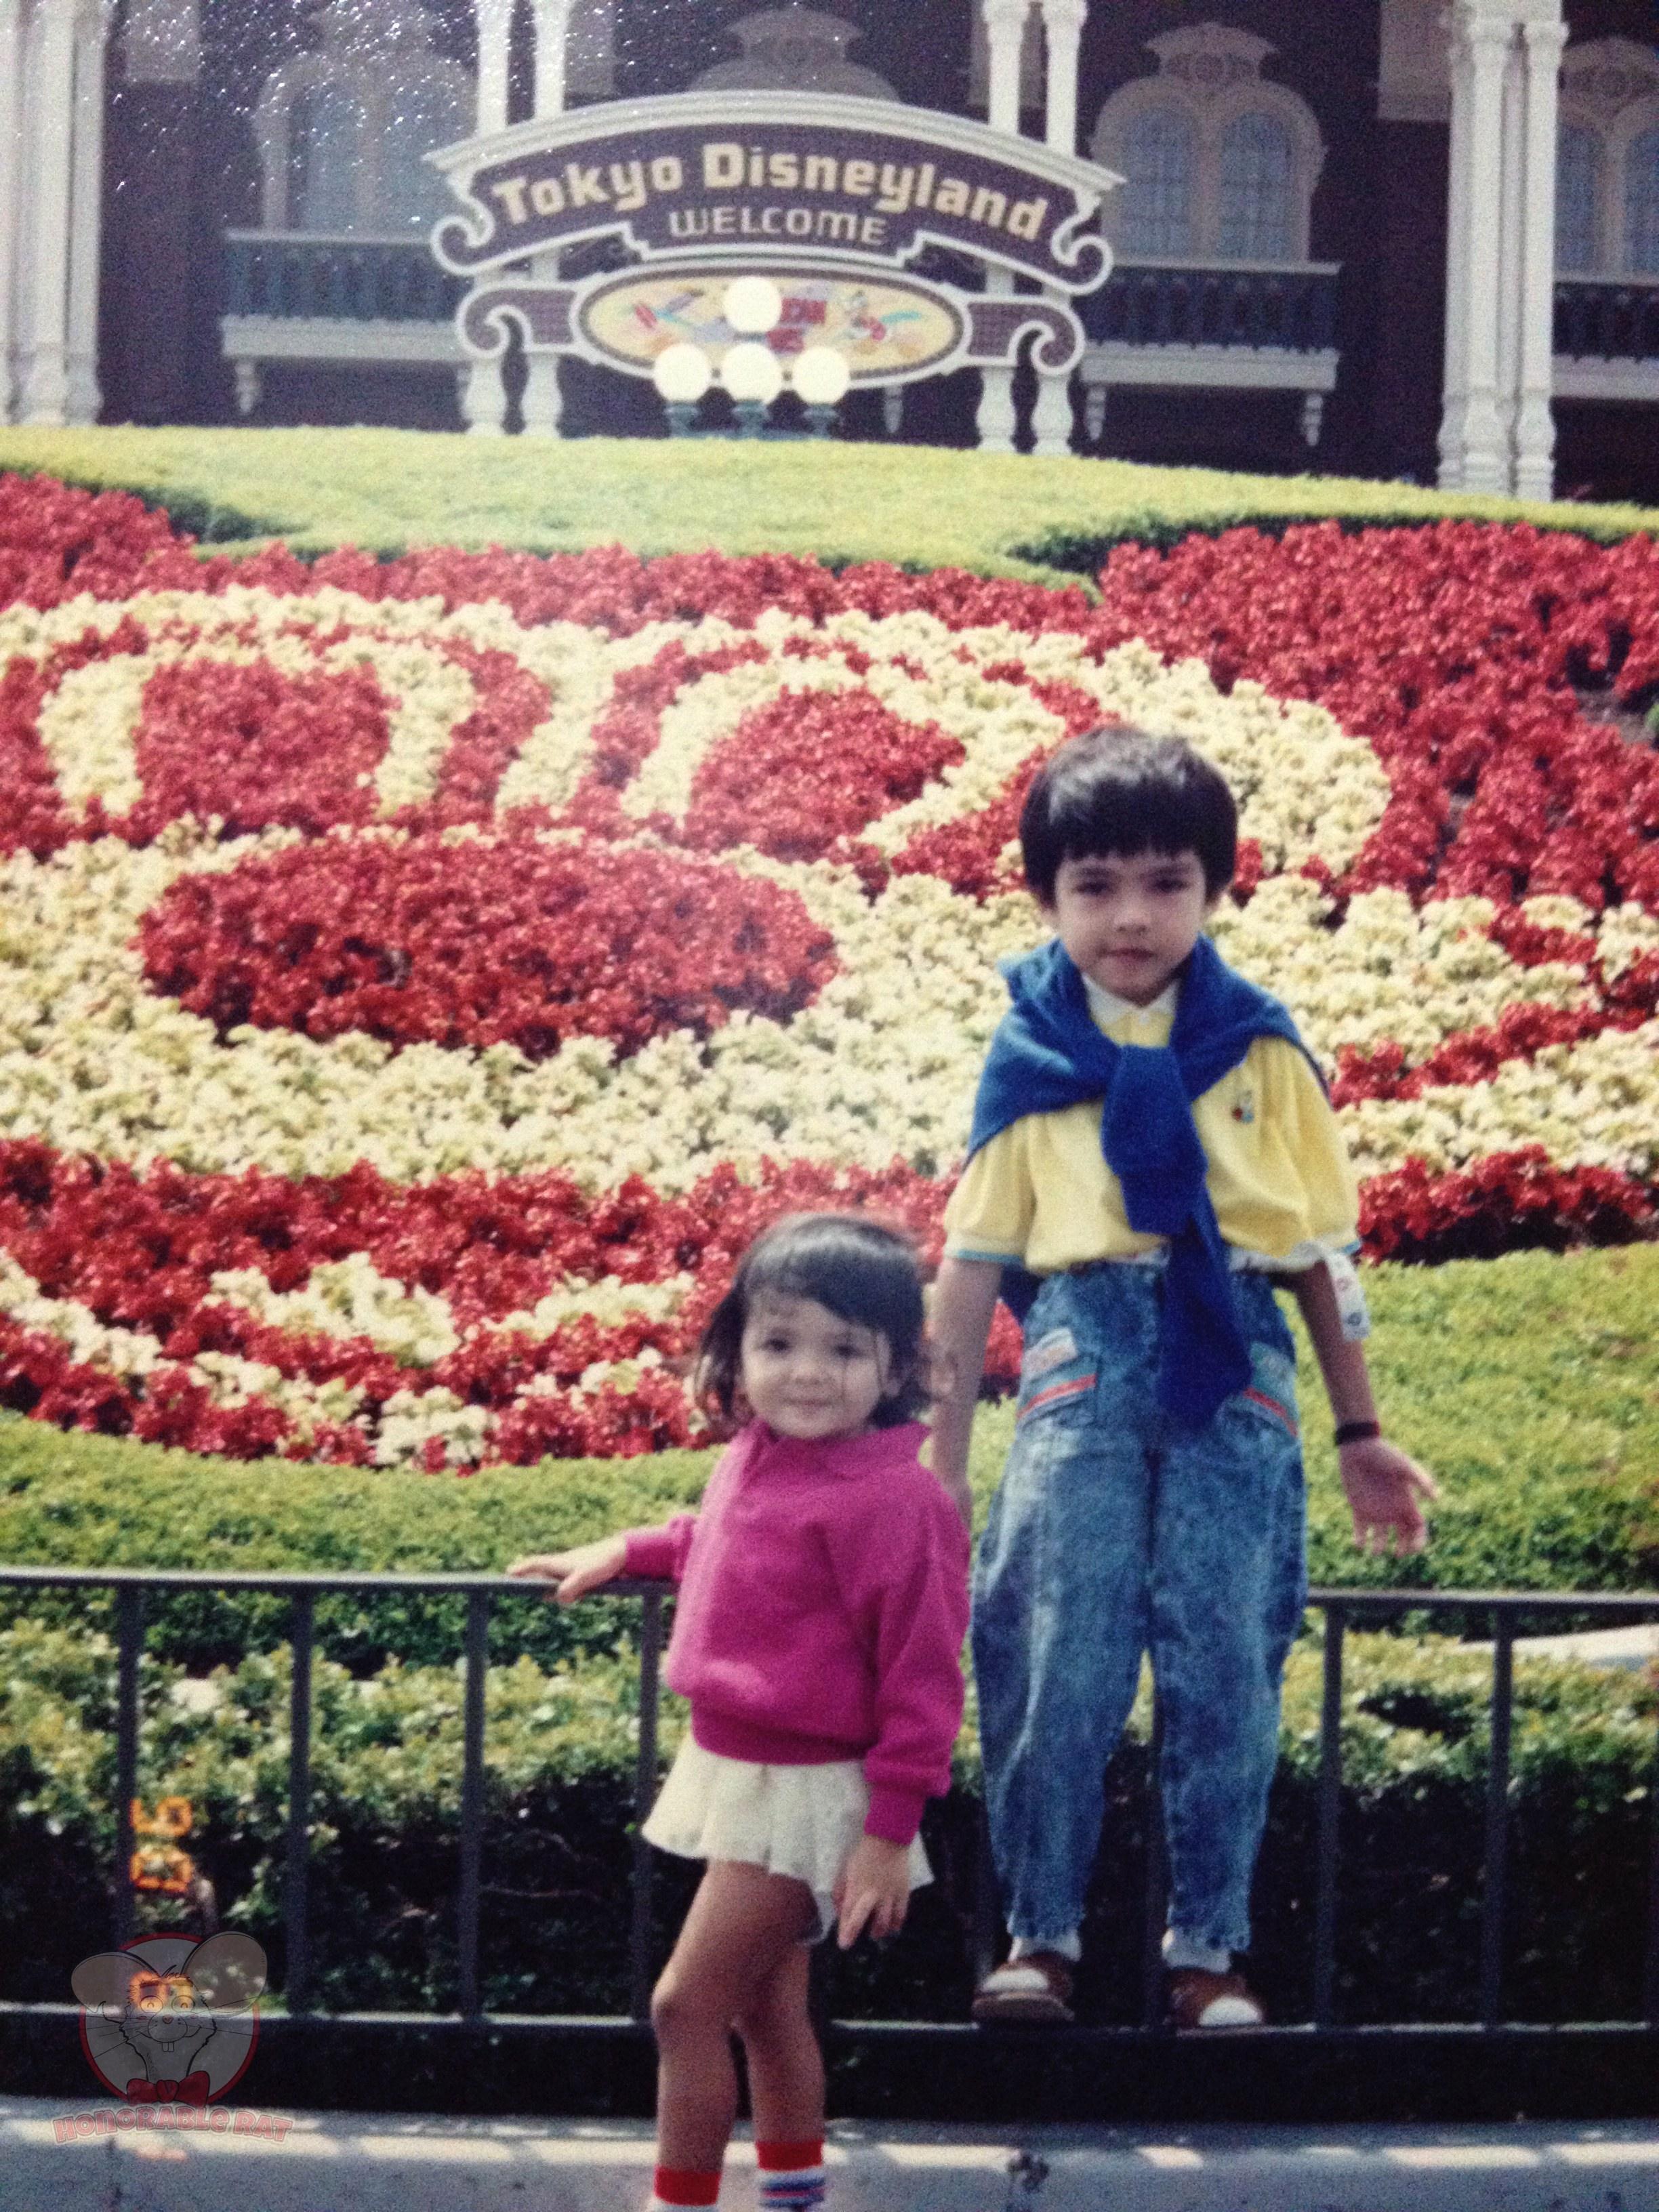 My sister, Natasha, and I at Tokyo Disneyland when we were kids